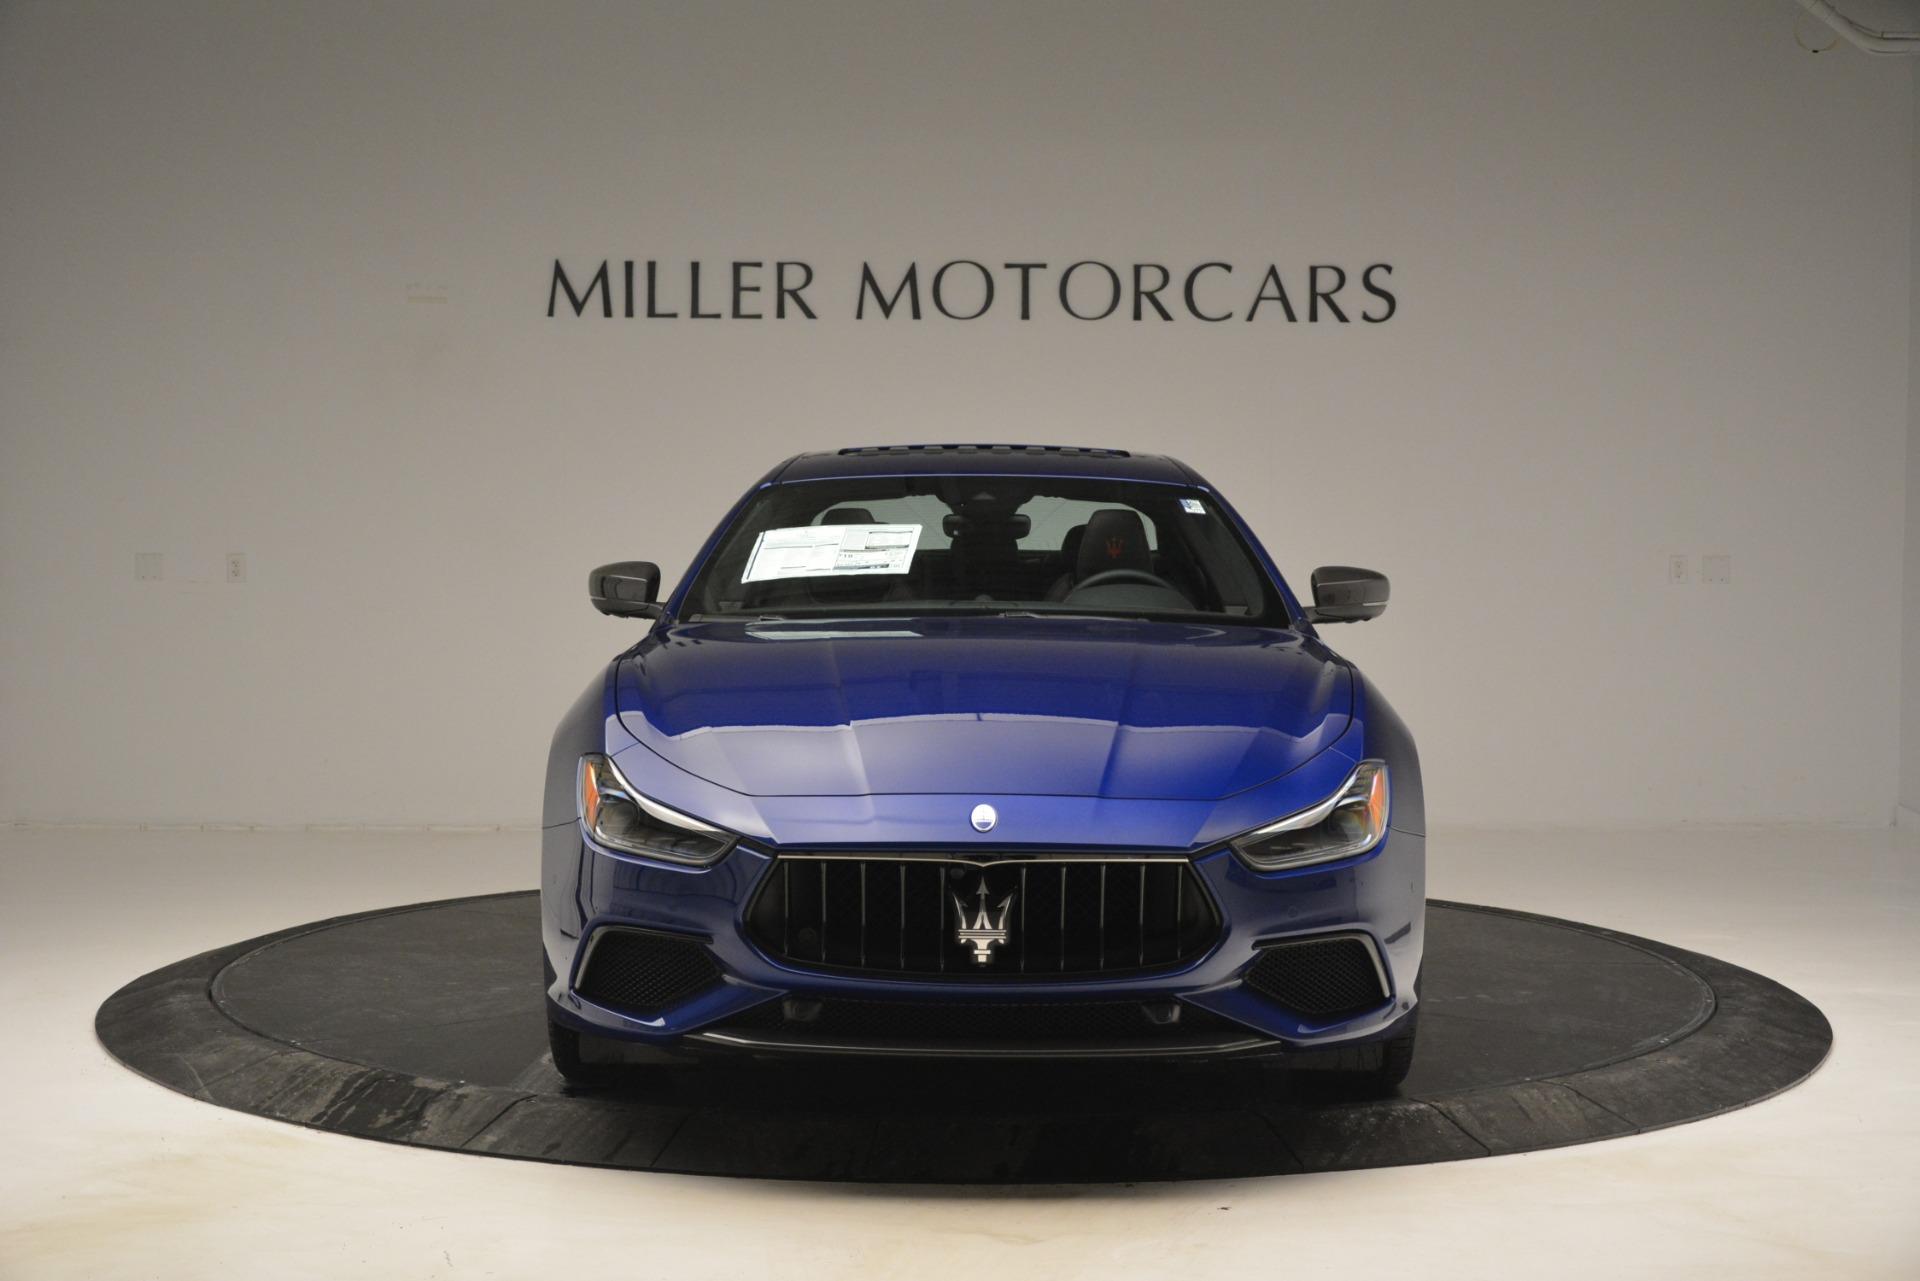 New 2019 Maserati Ghibli S Q4 GranSport For Sale In Greenwich, CT 2978_p12